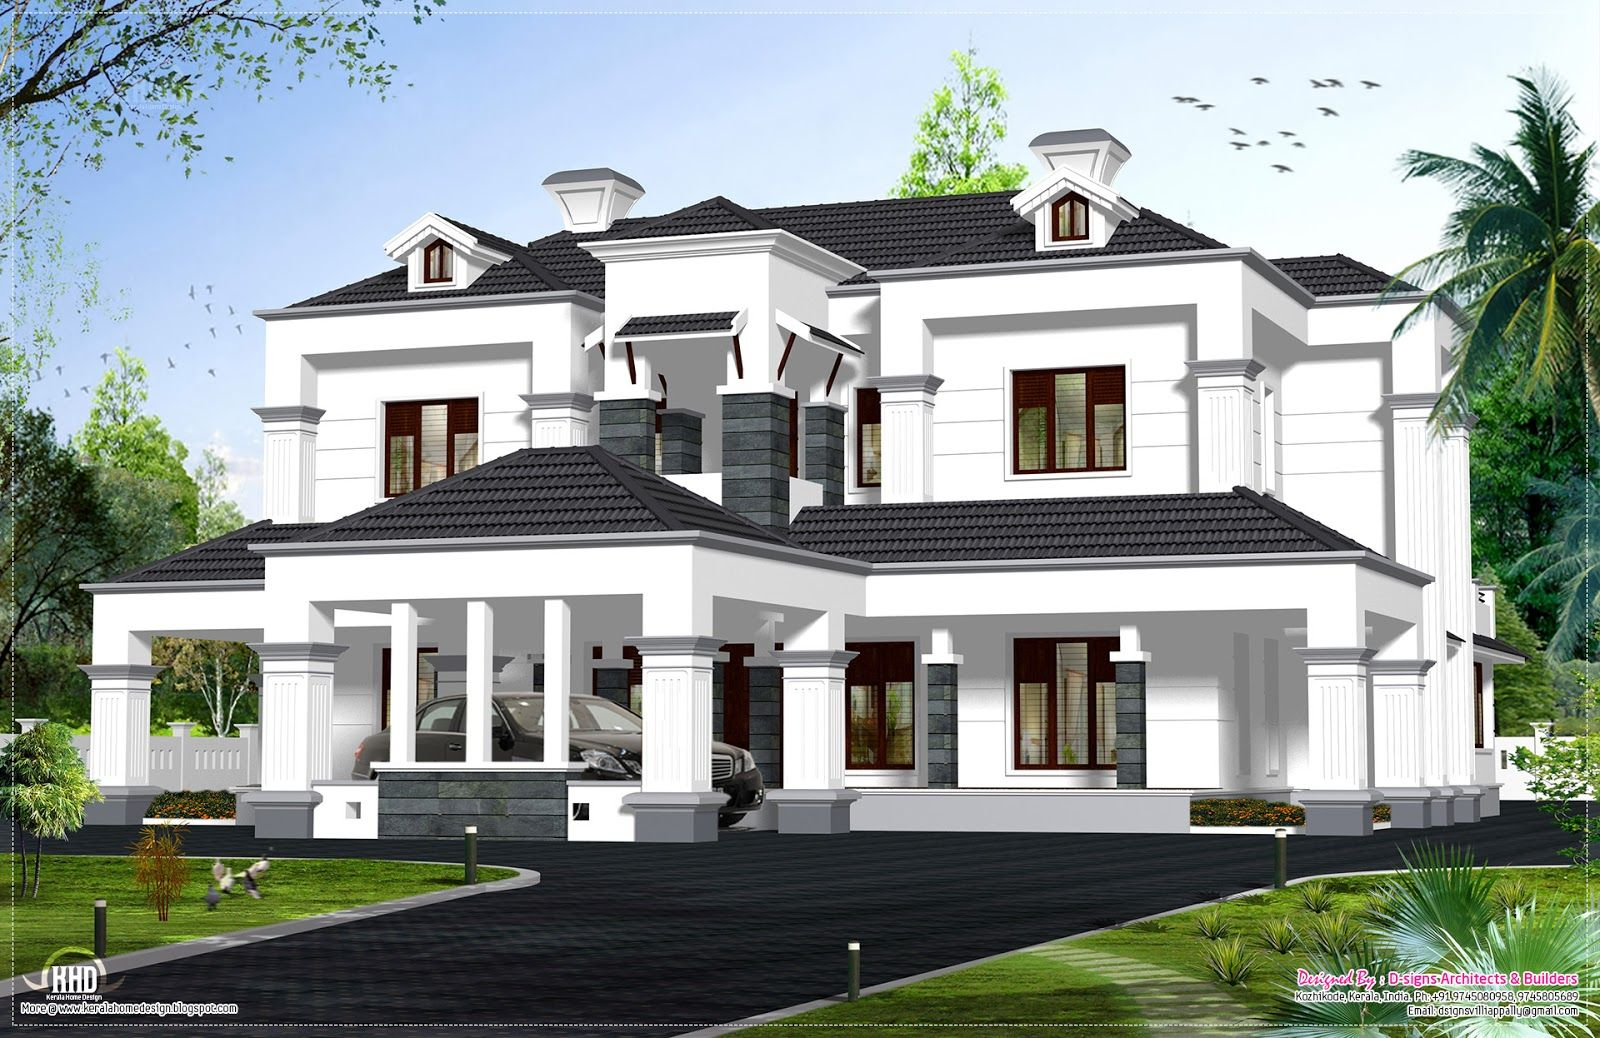 Floor plan design kerala single house plans storey trend Luxury victorian house plans